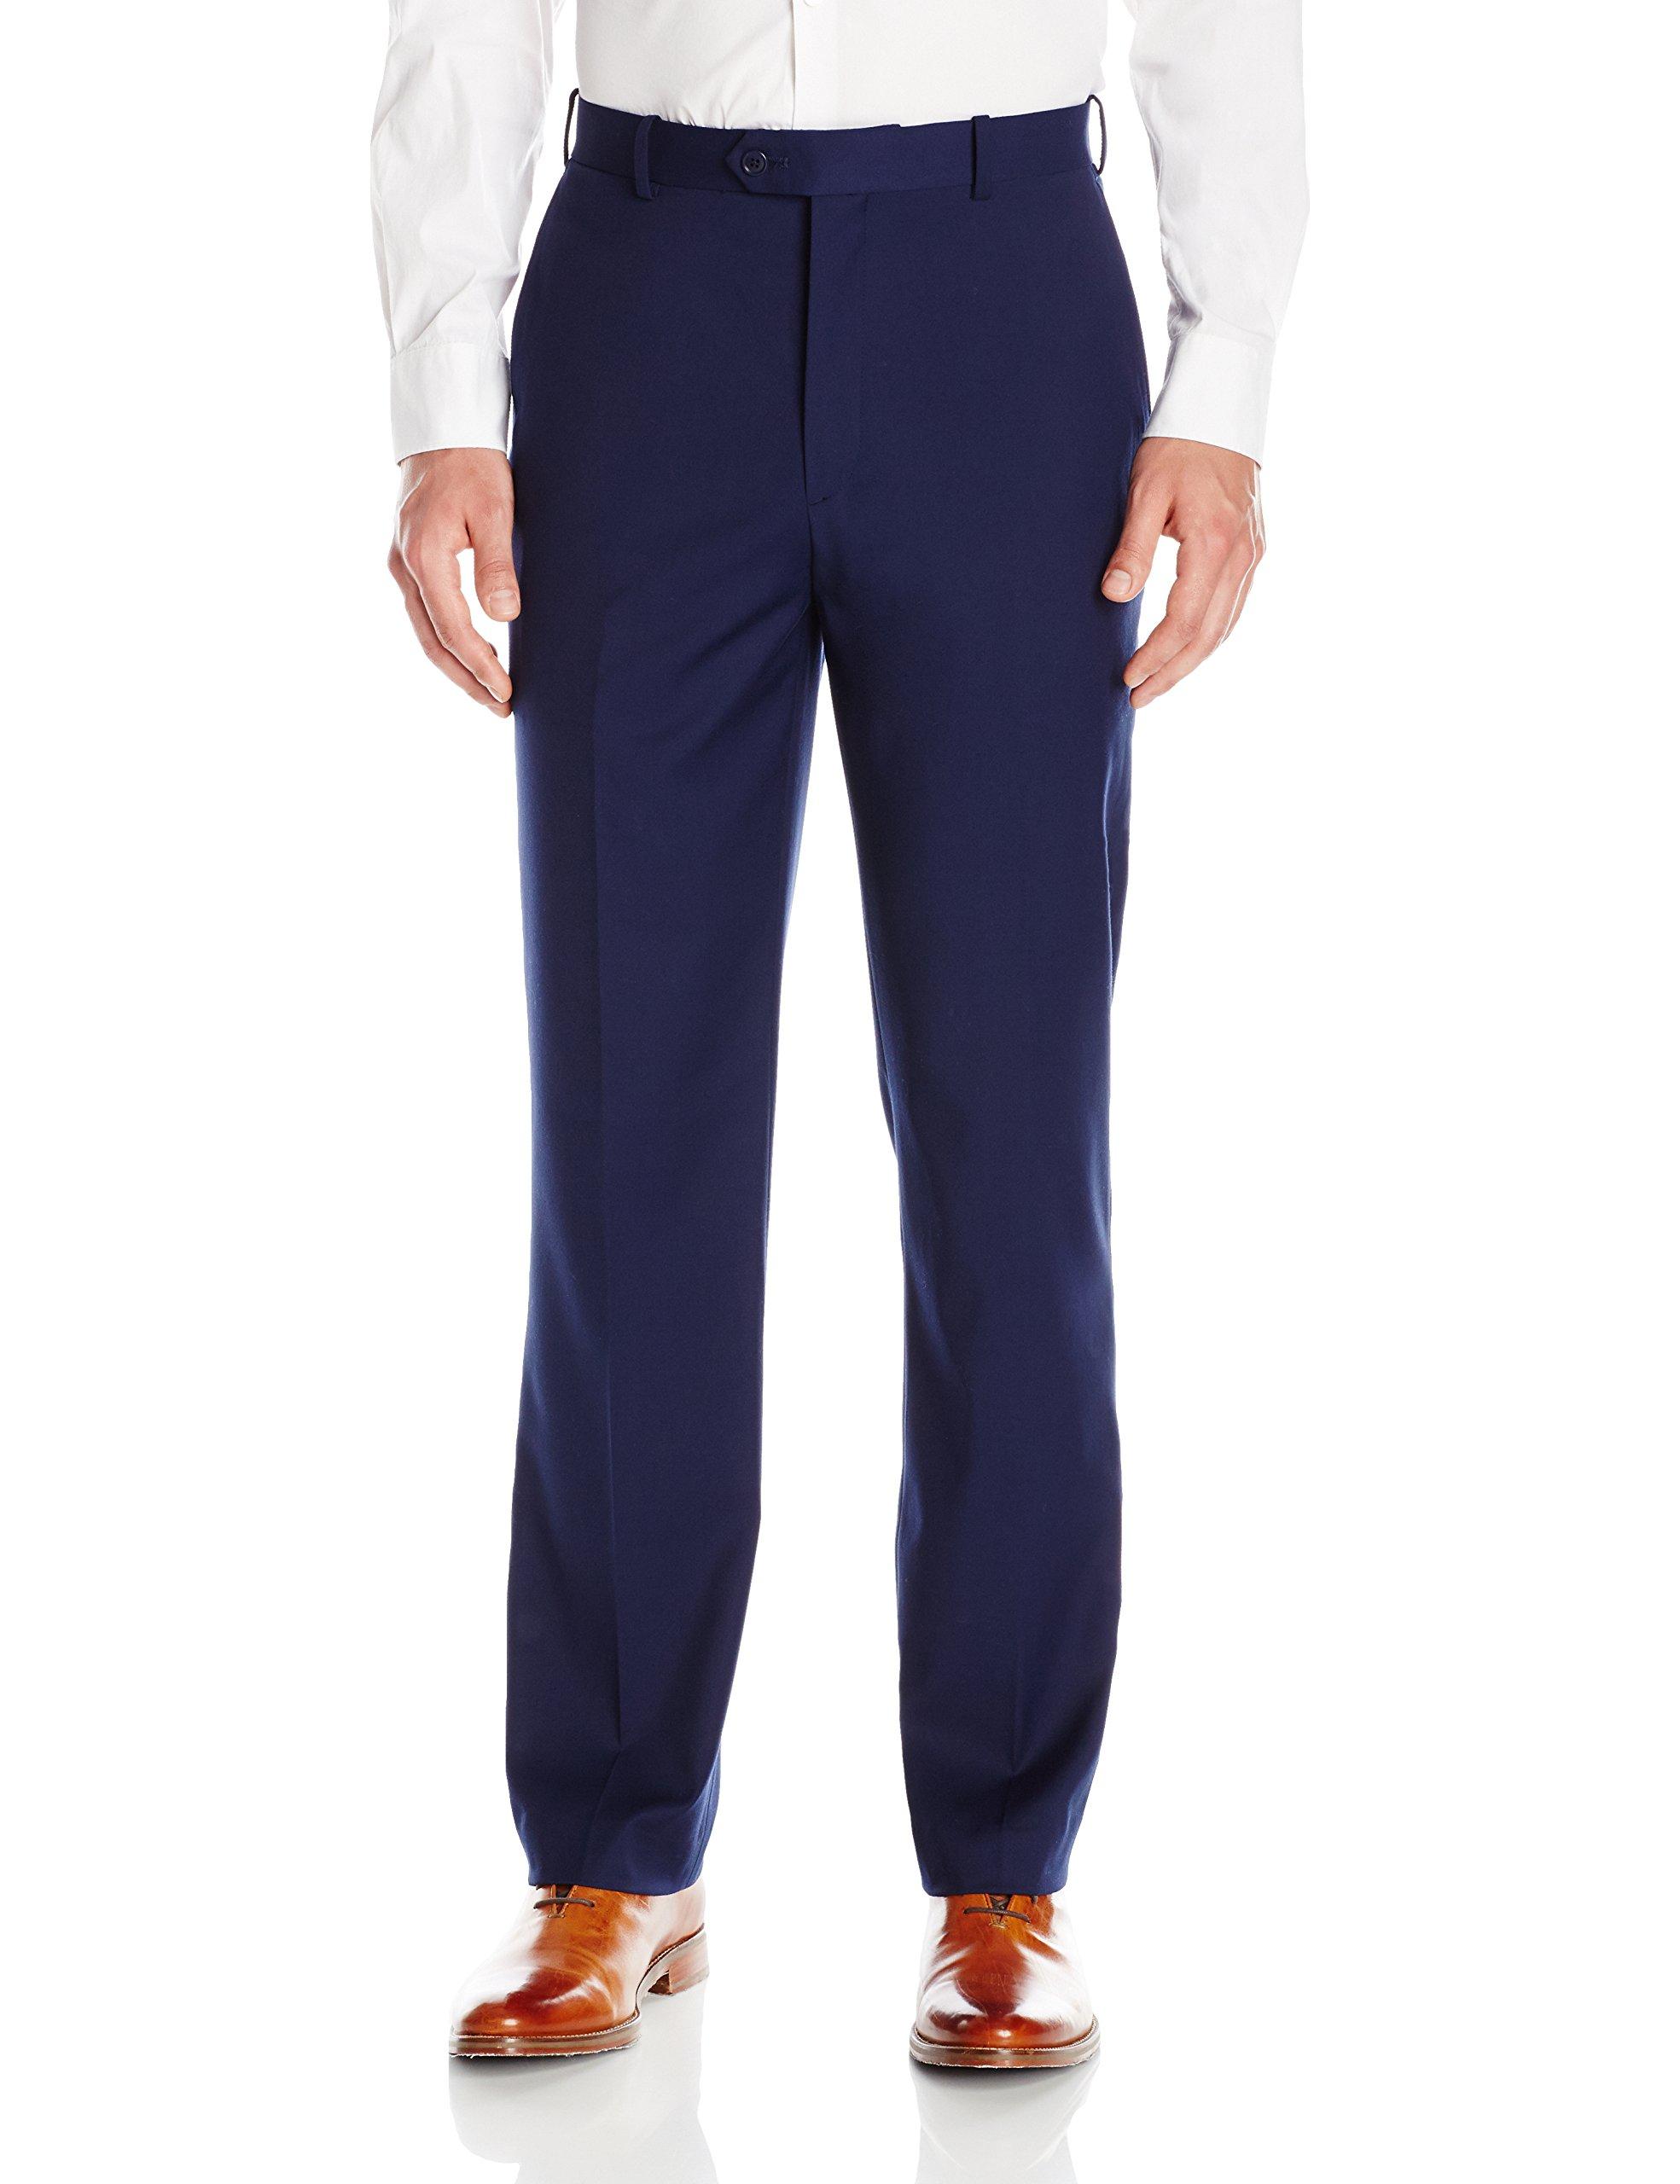 Adolfo Men's Micro Tech Flat Front Suit Pant, Blue with Lycra Stretch, 44Wx30L